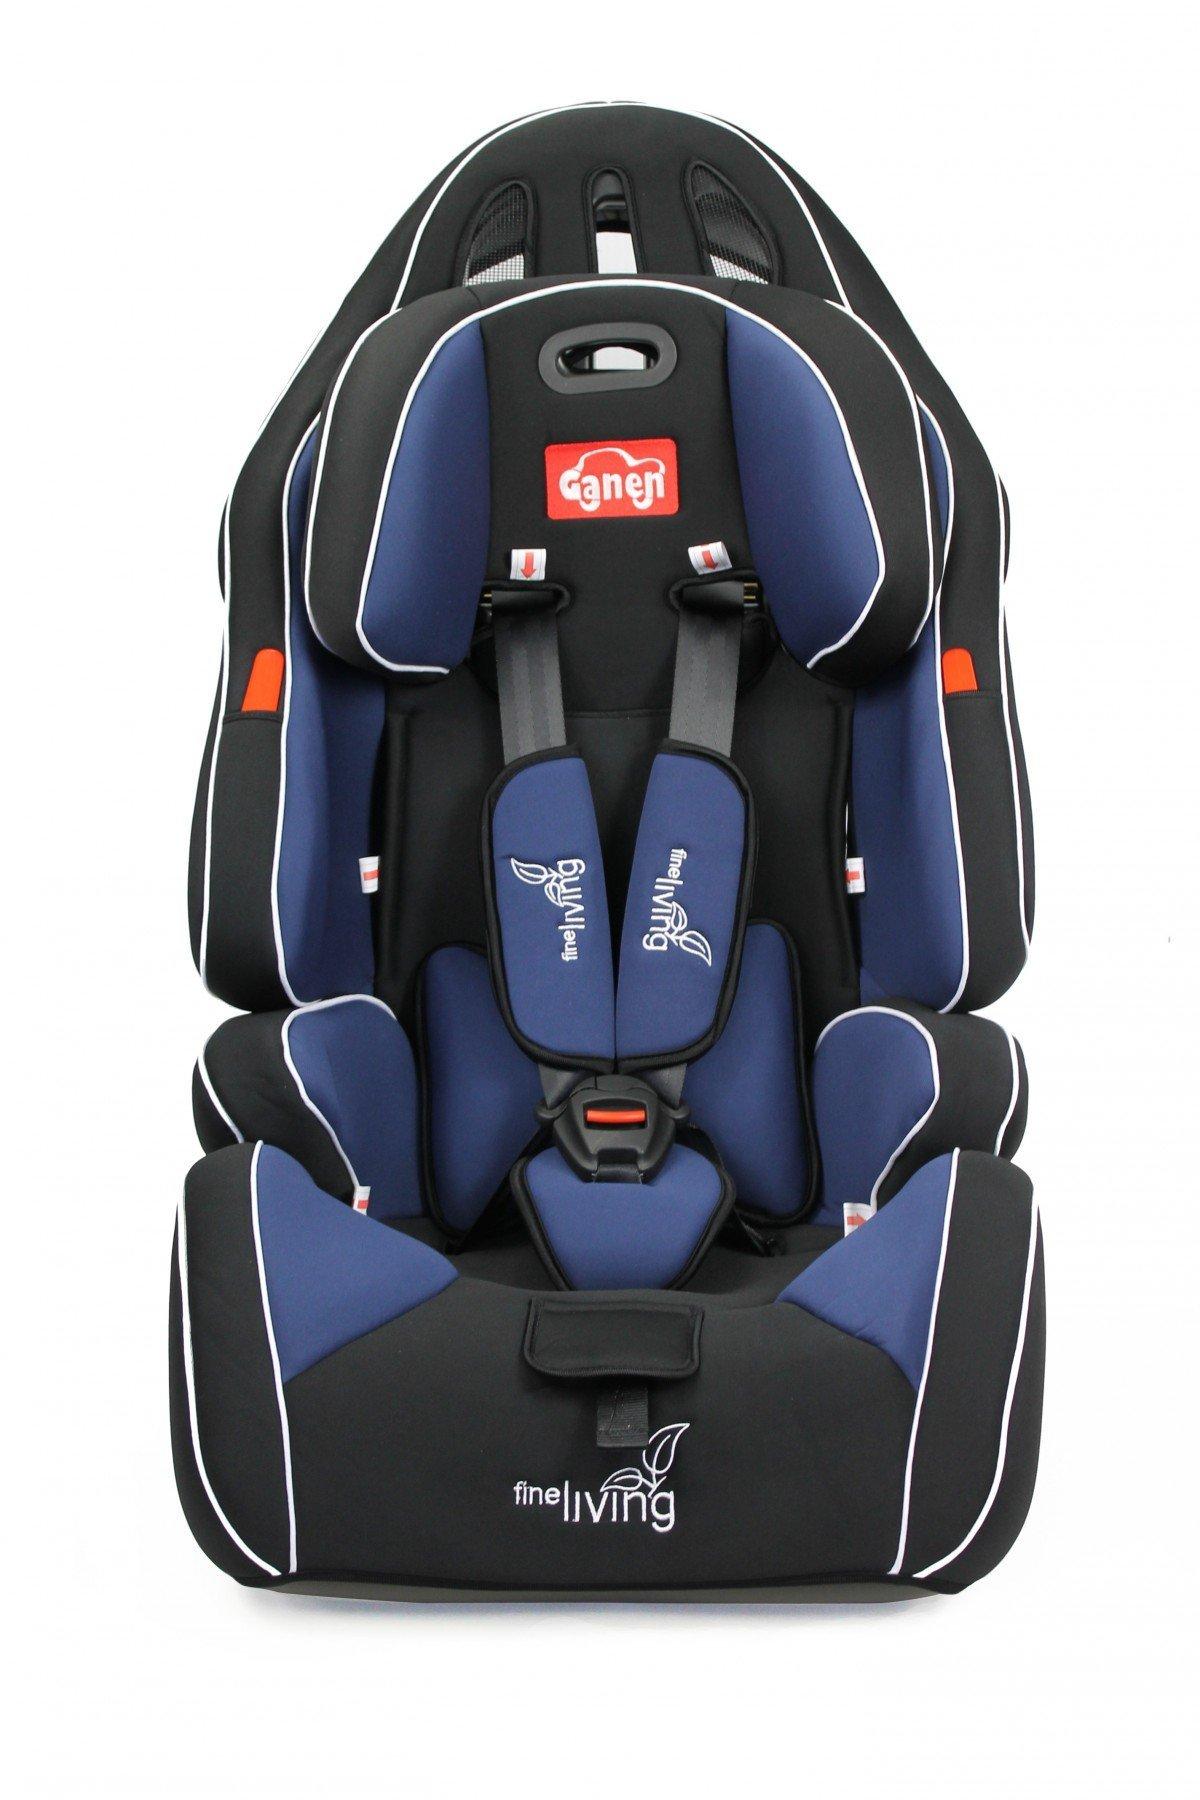 Fine Living Car Seat in Navy & Black